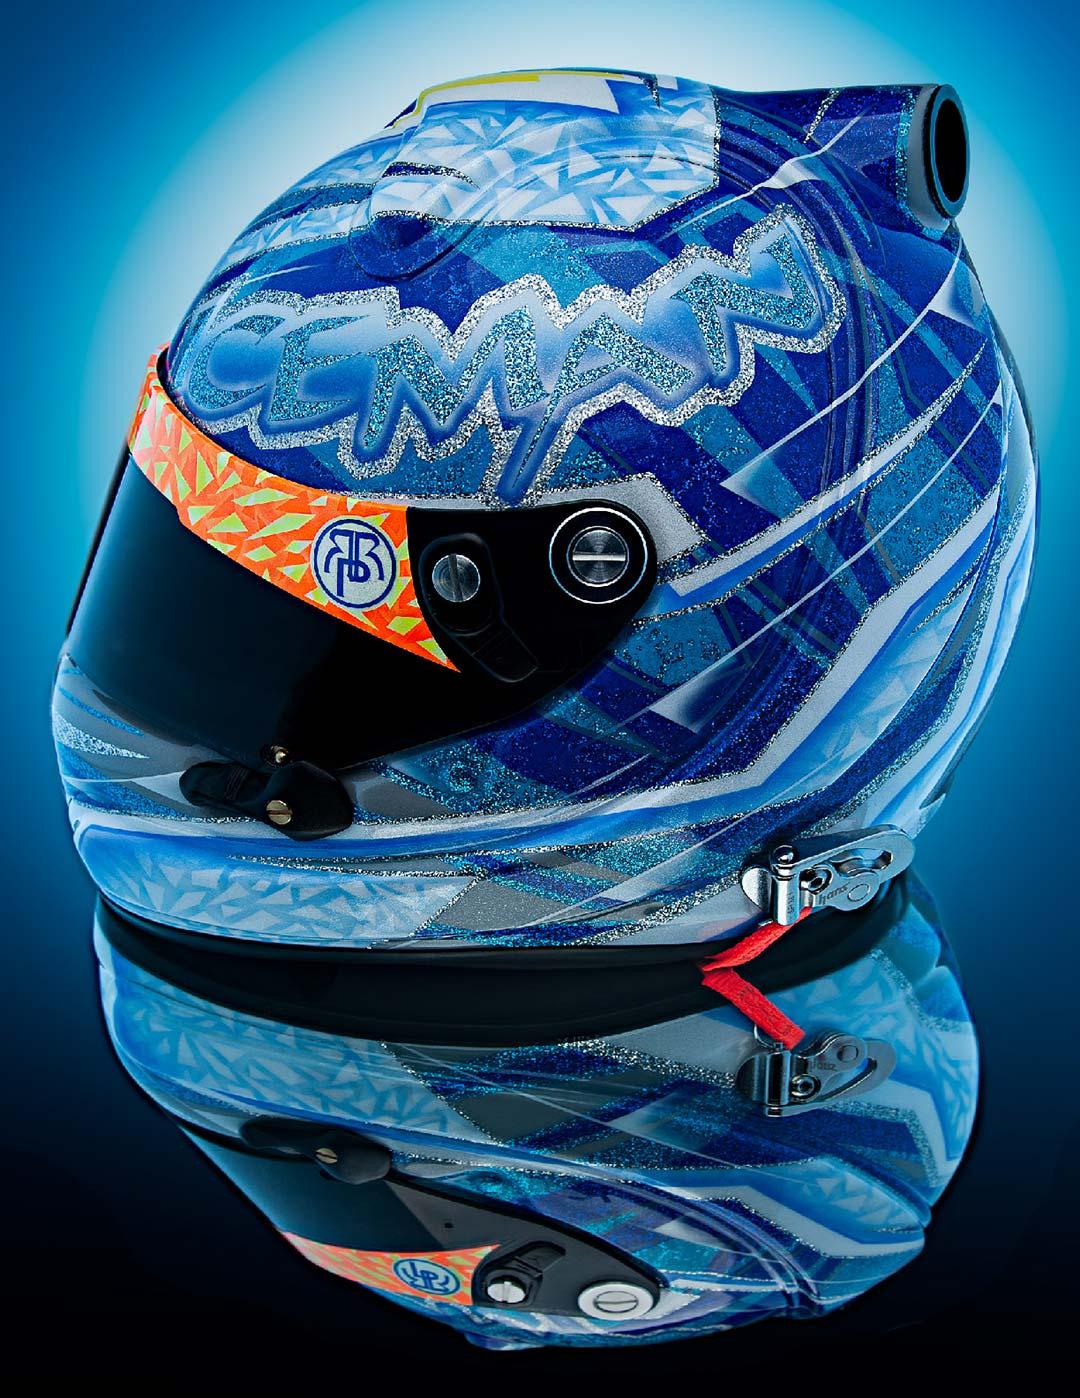 Styled reflection of custom racing helmet